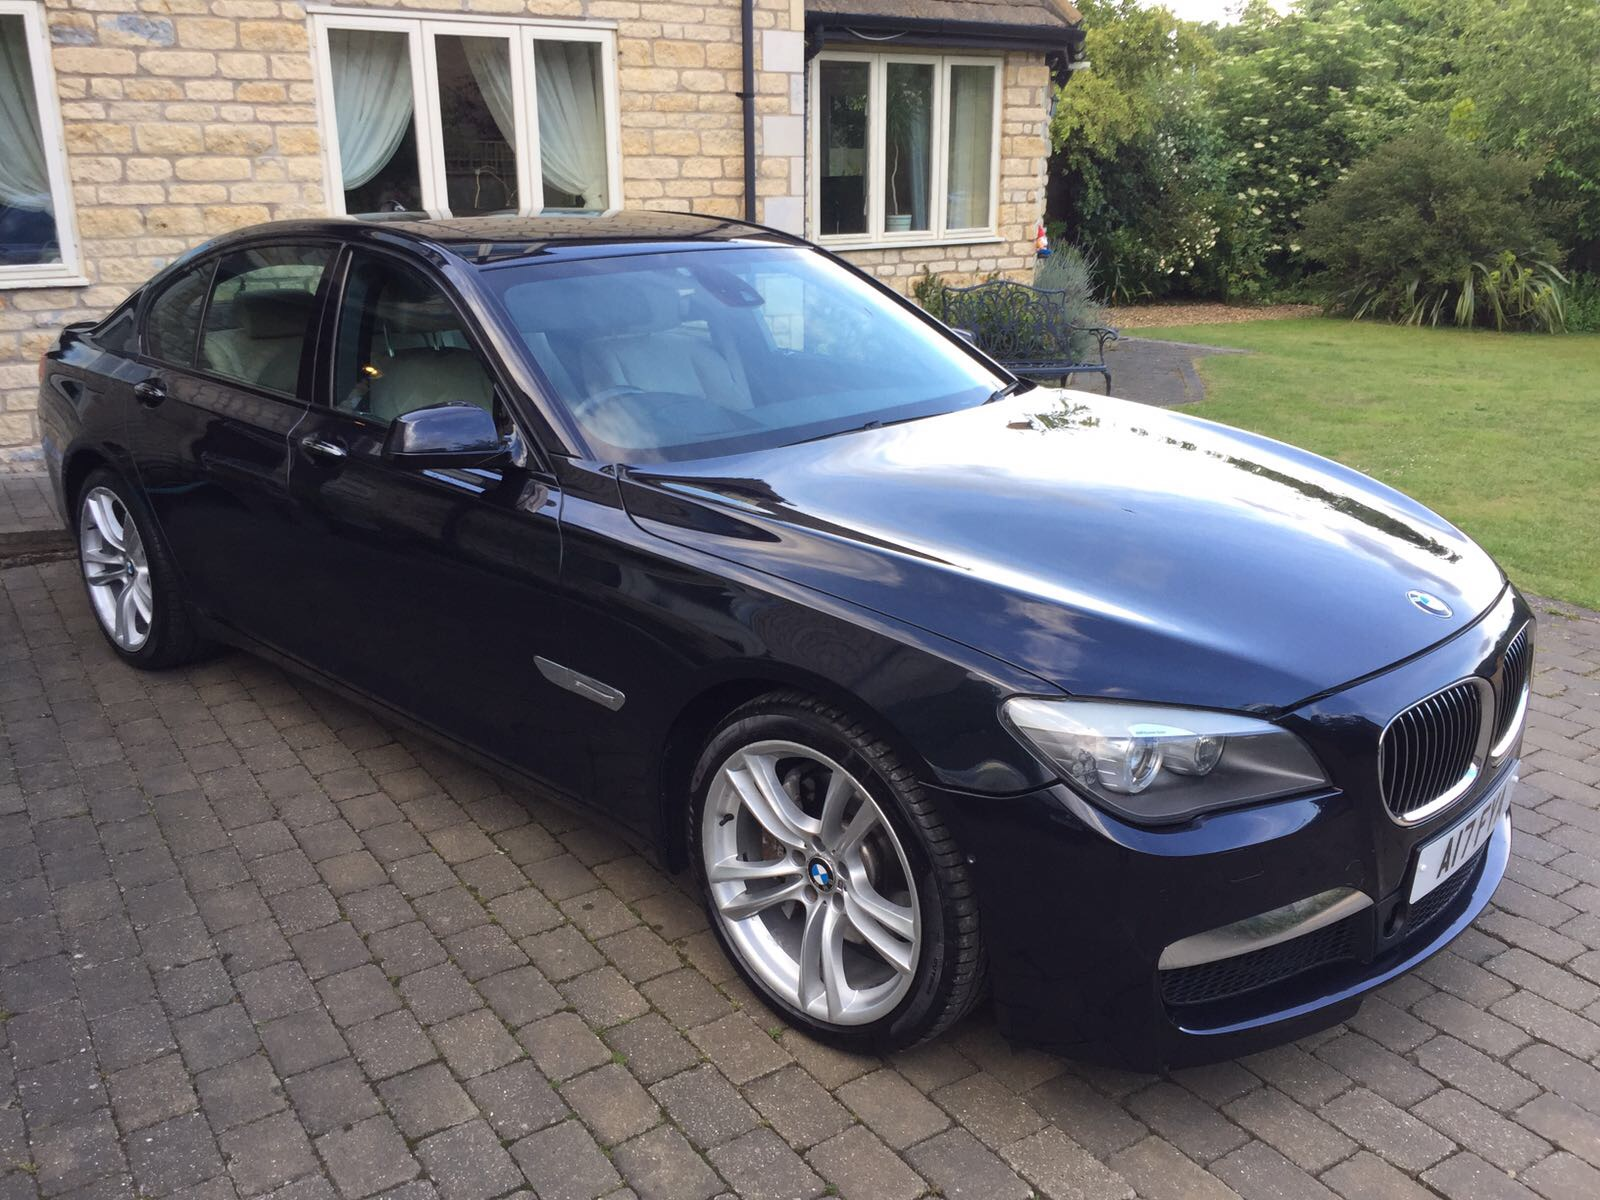 2010 BMW 7 Series 3.0 Auto Petrol